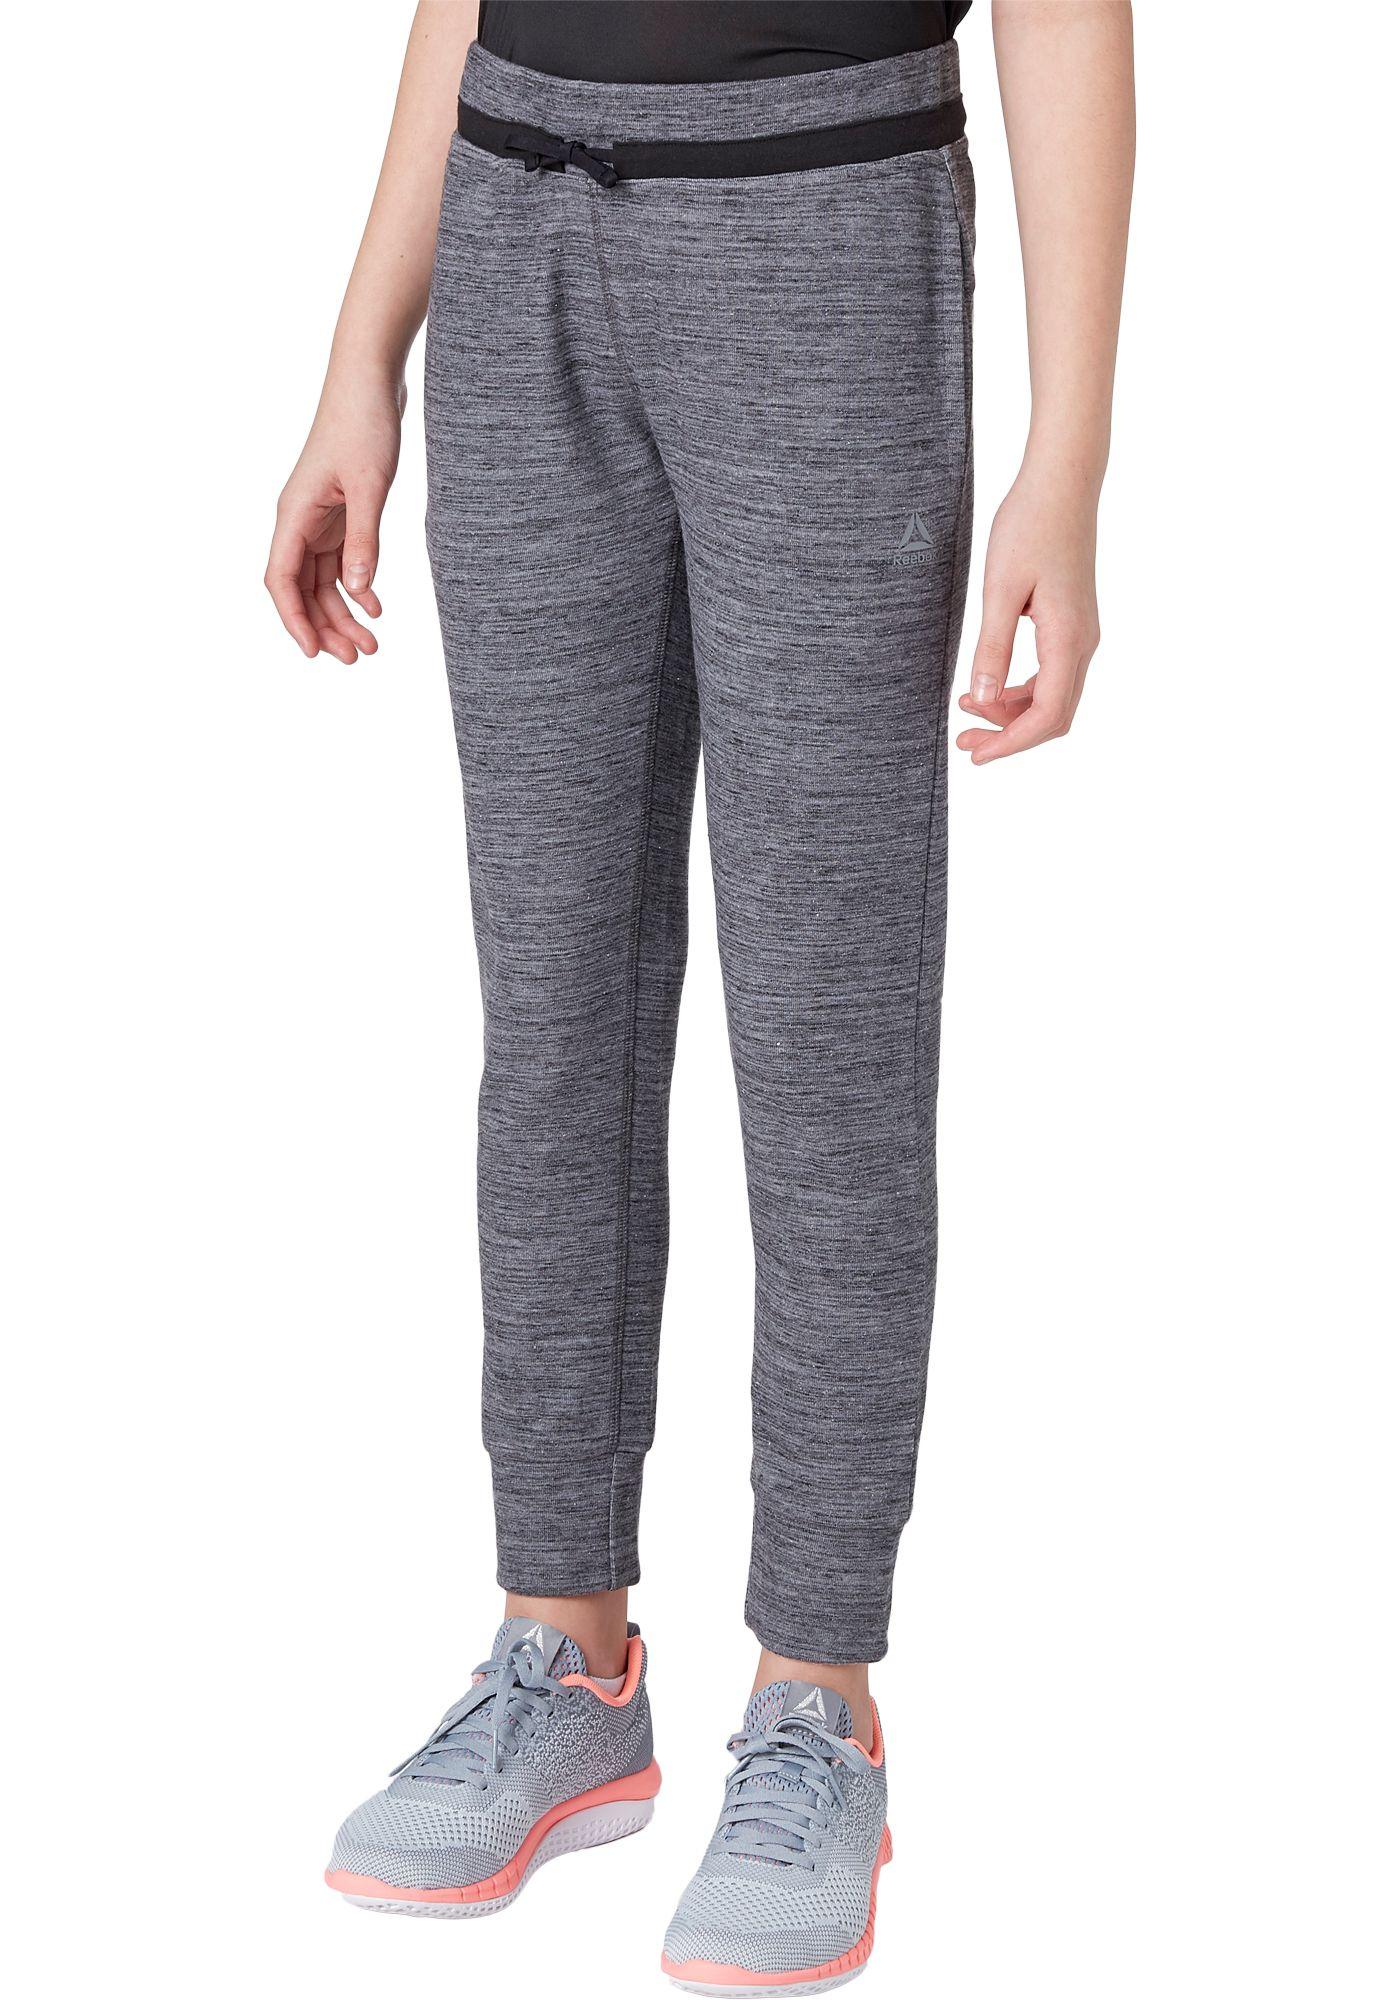 Reebok Girls' Double Knit Jogger Pants